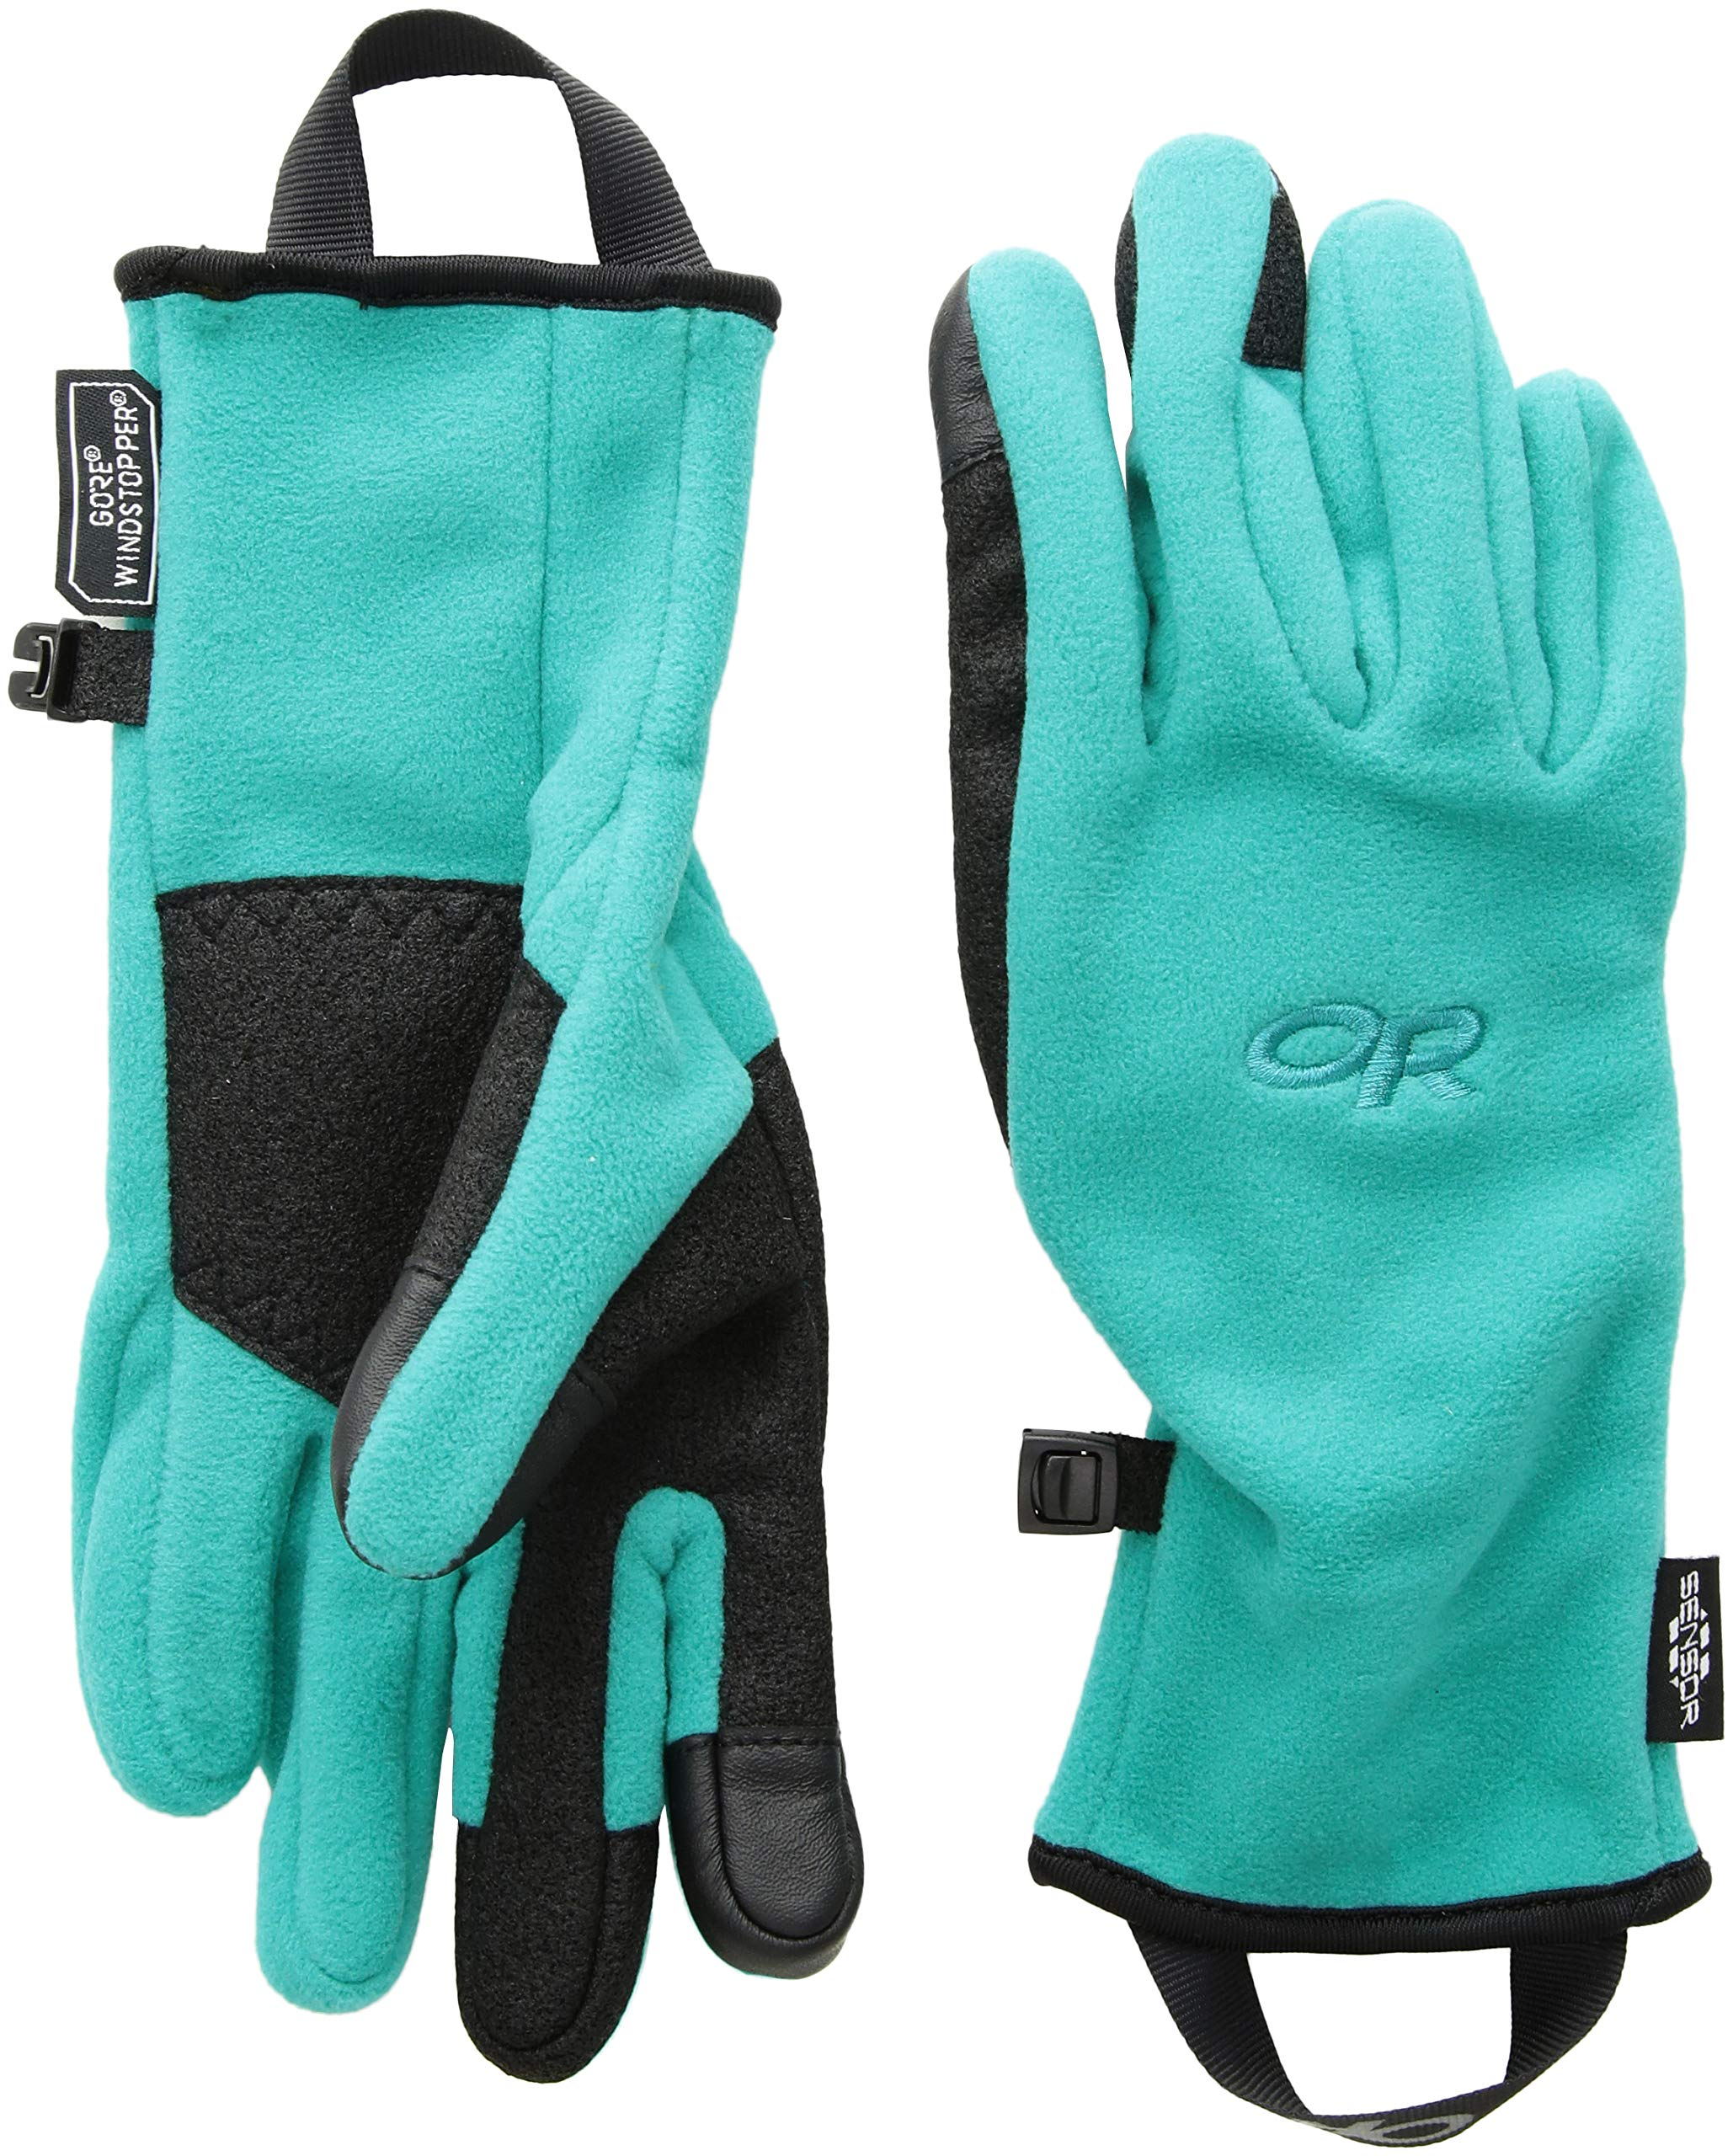 Outdoor Research Women's Gripper Sensor GORE-TEX INFINIUM Gloves – Windproof, Tough, Breathable Wicking Gear